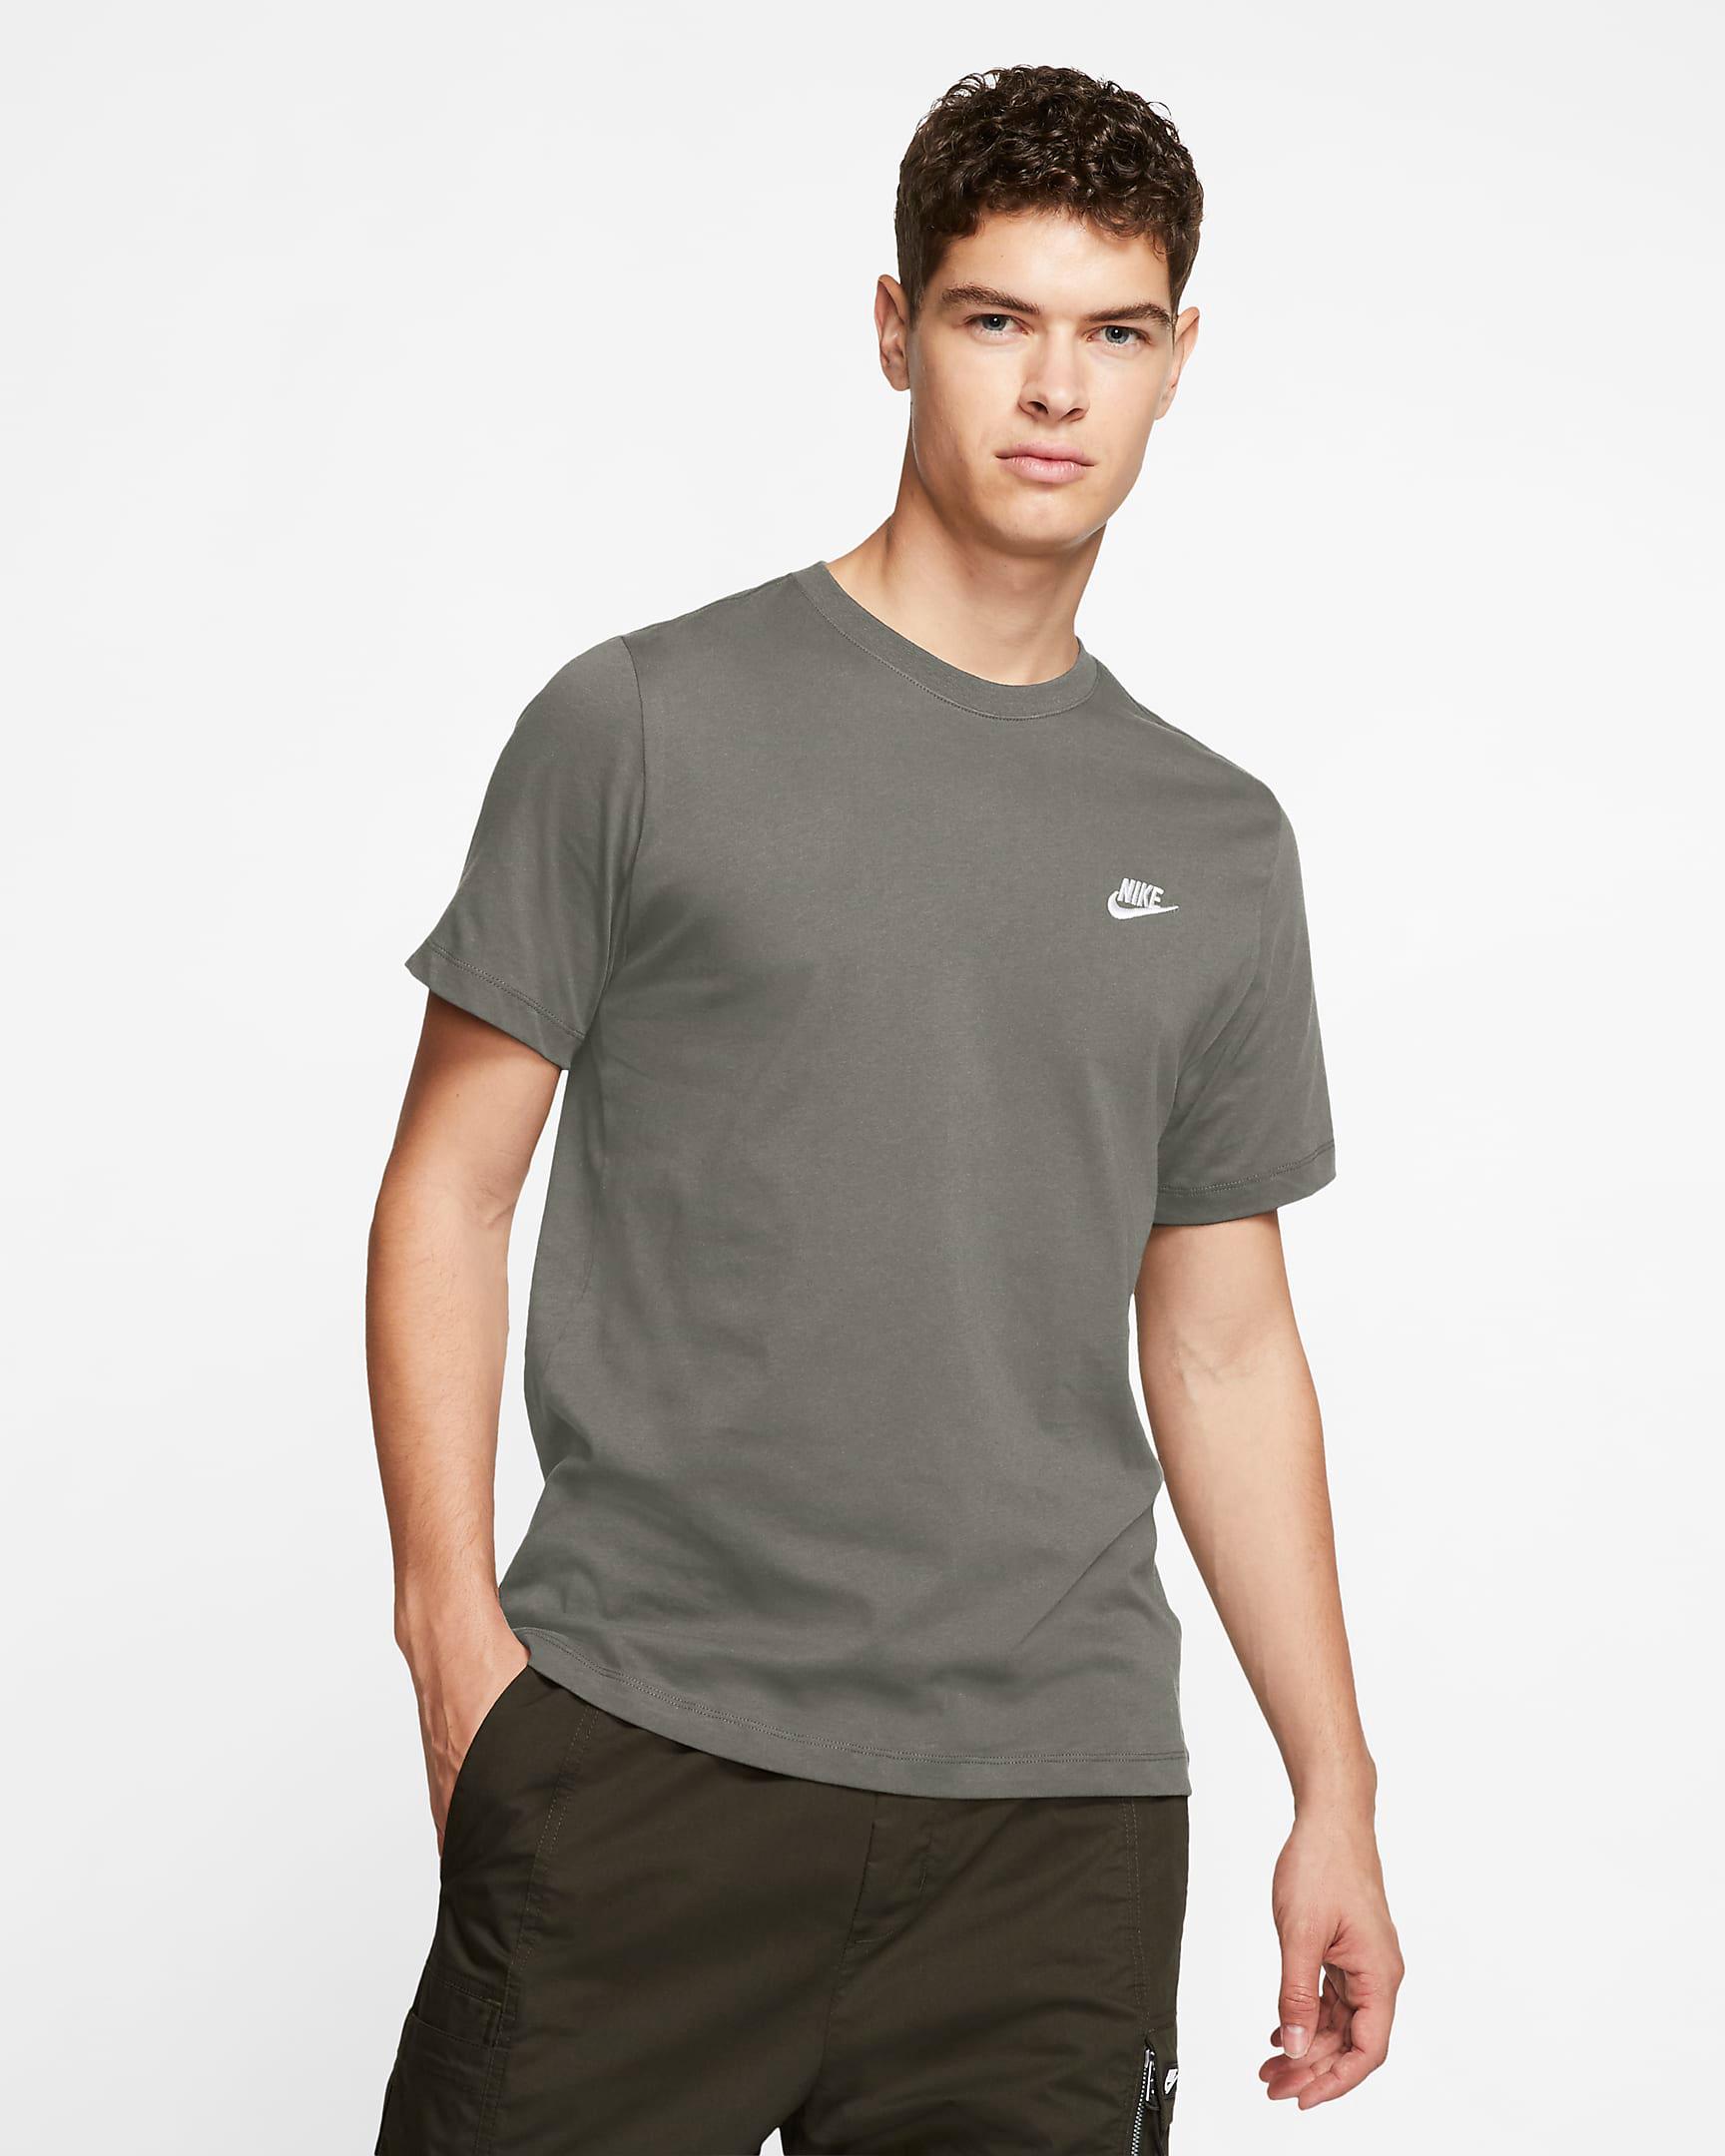 nike-light-army-club-tee-shirt